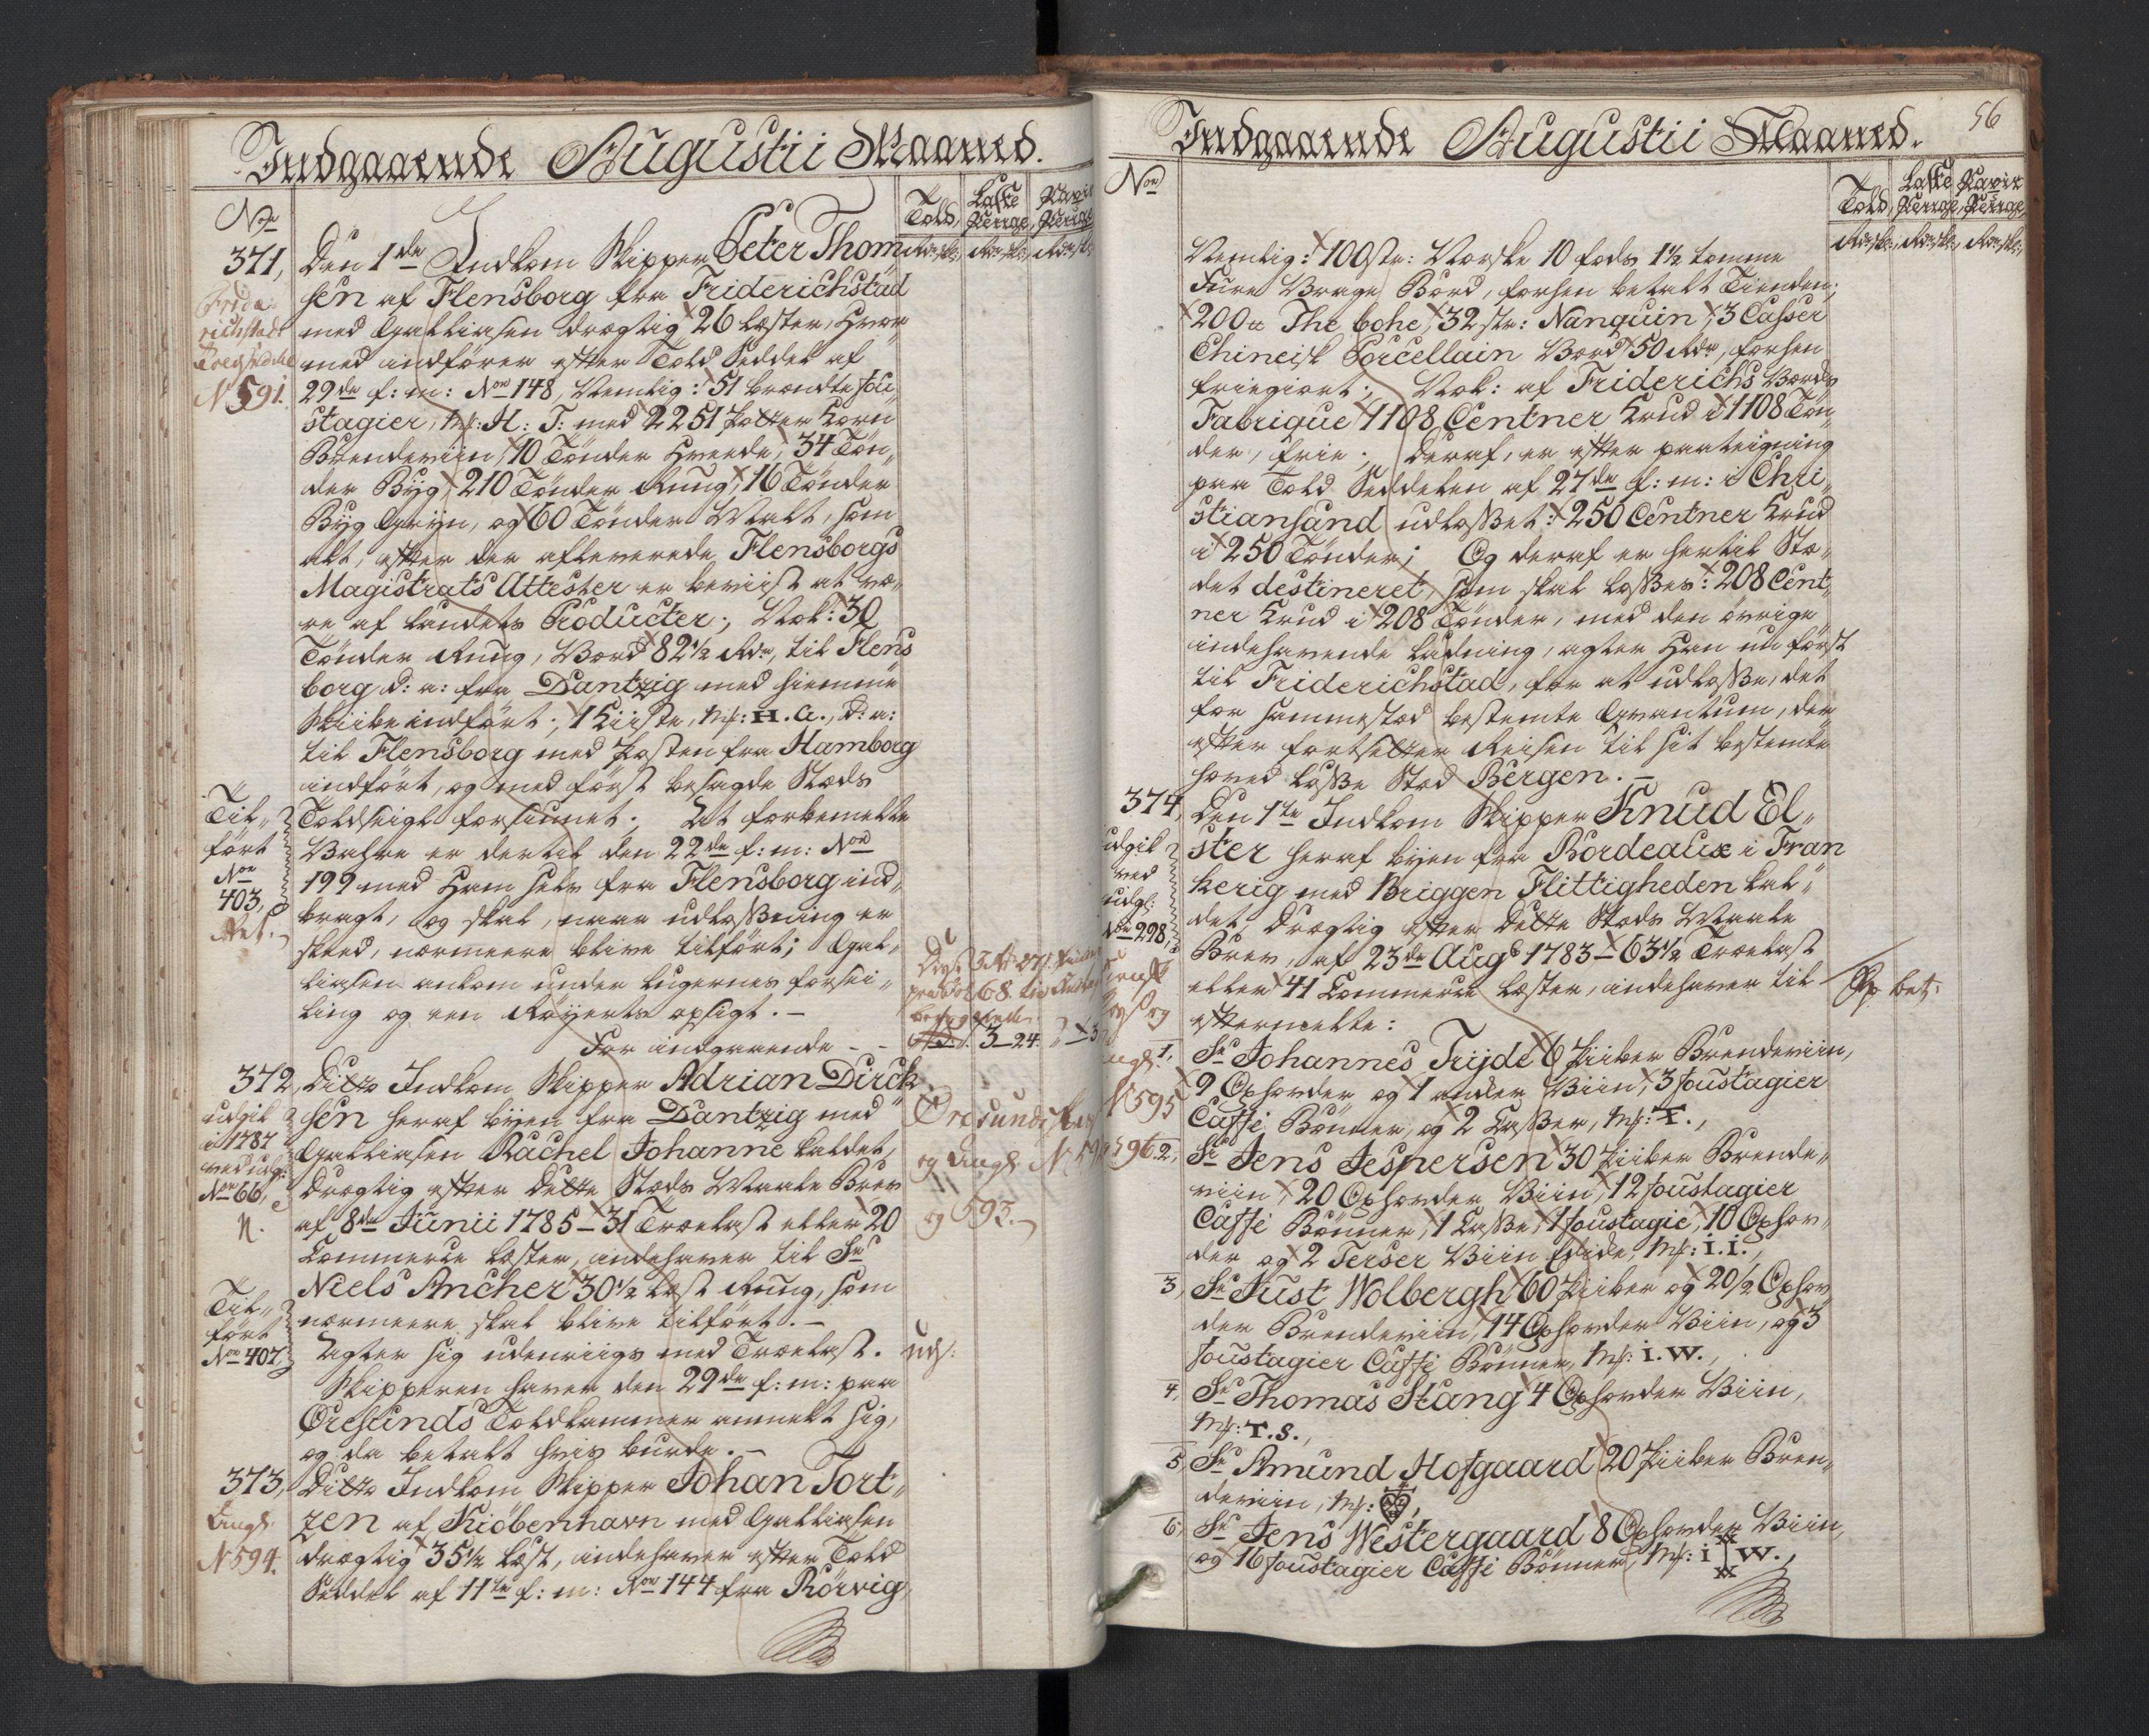 RA, Generaltollkammeret, tollregnskaper, R01/L0130: Tollregnskaper Fredrikshald, 1786, s. 55b-56a